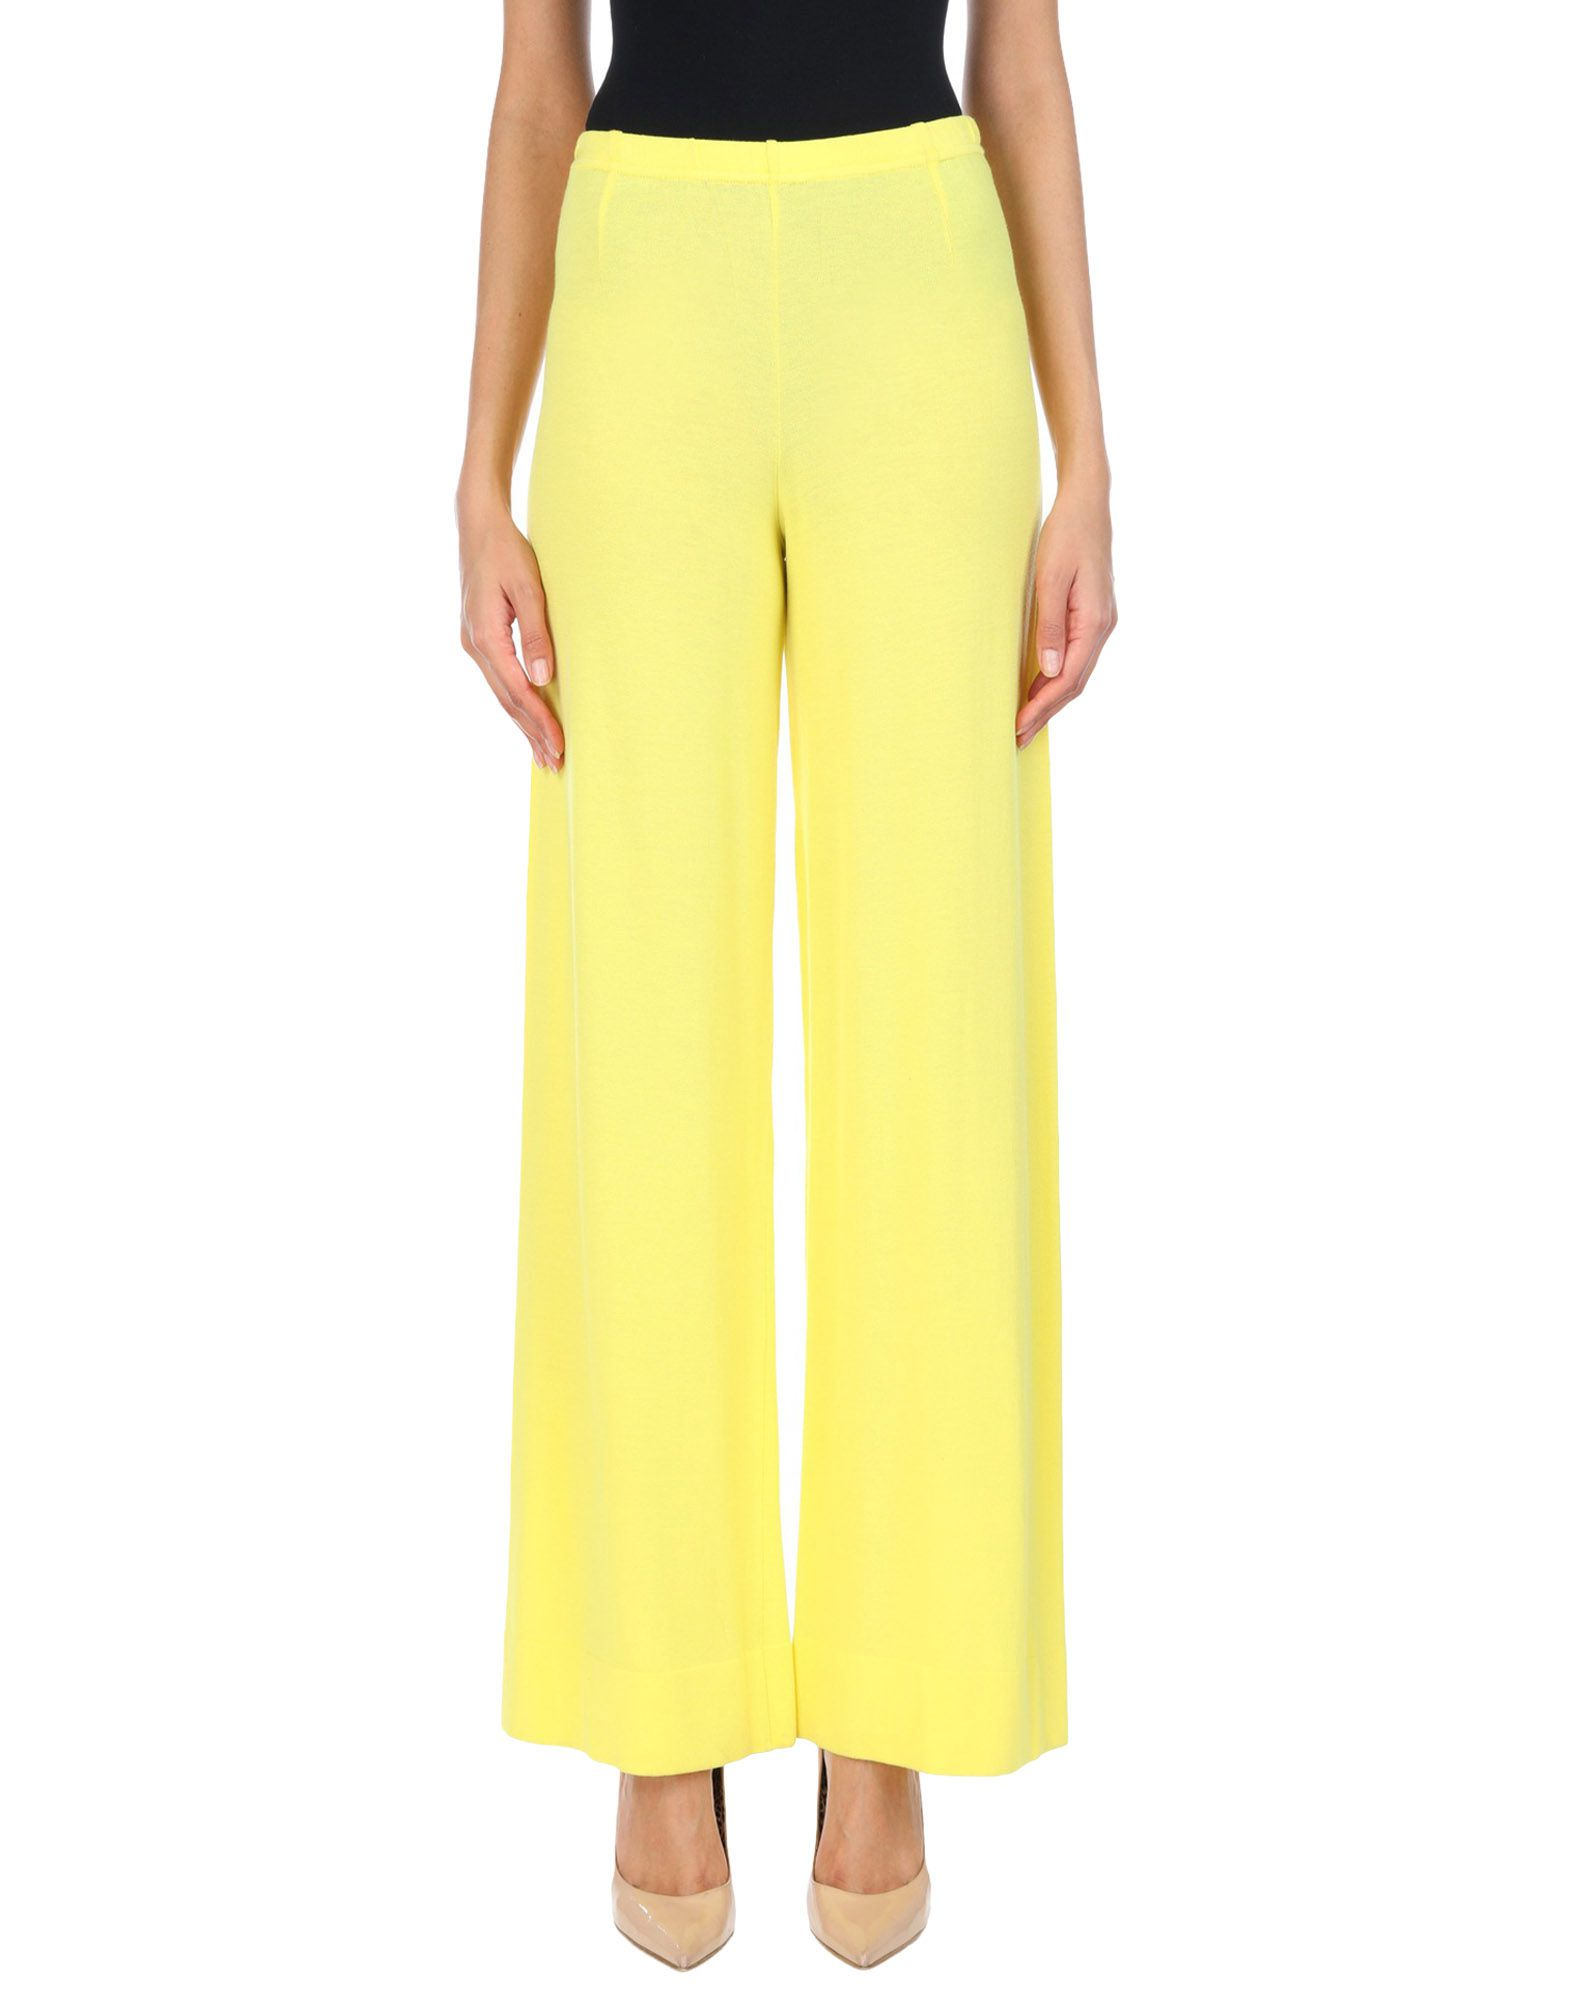 Pantalone Pantalone Neera donna - 13274615KN  mehr Rabatt